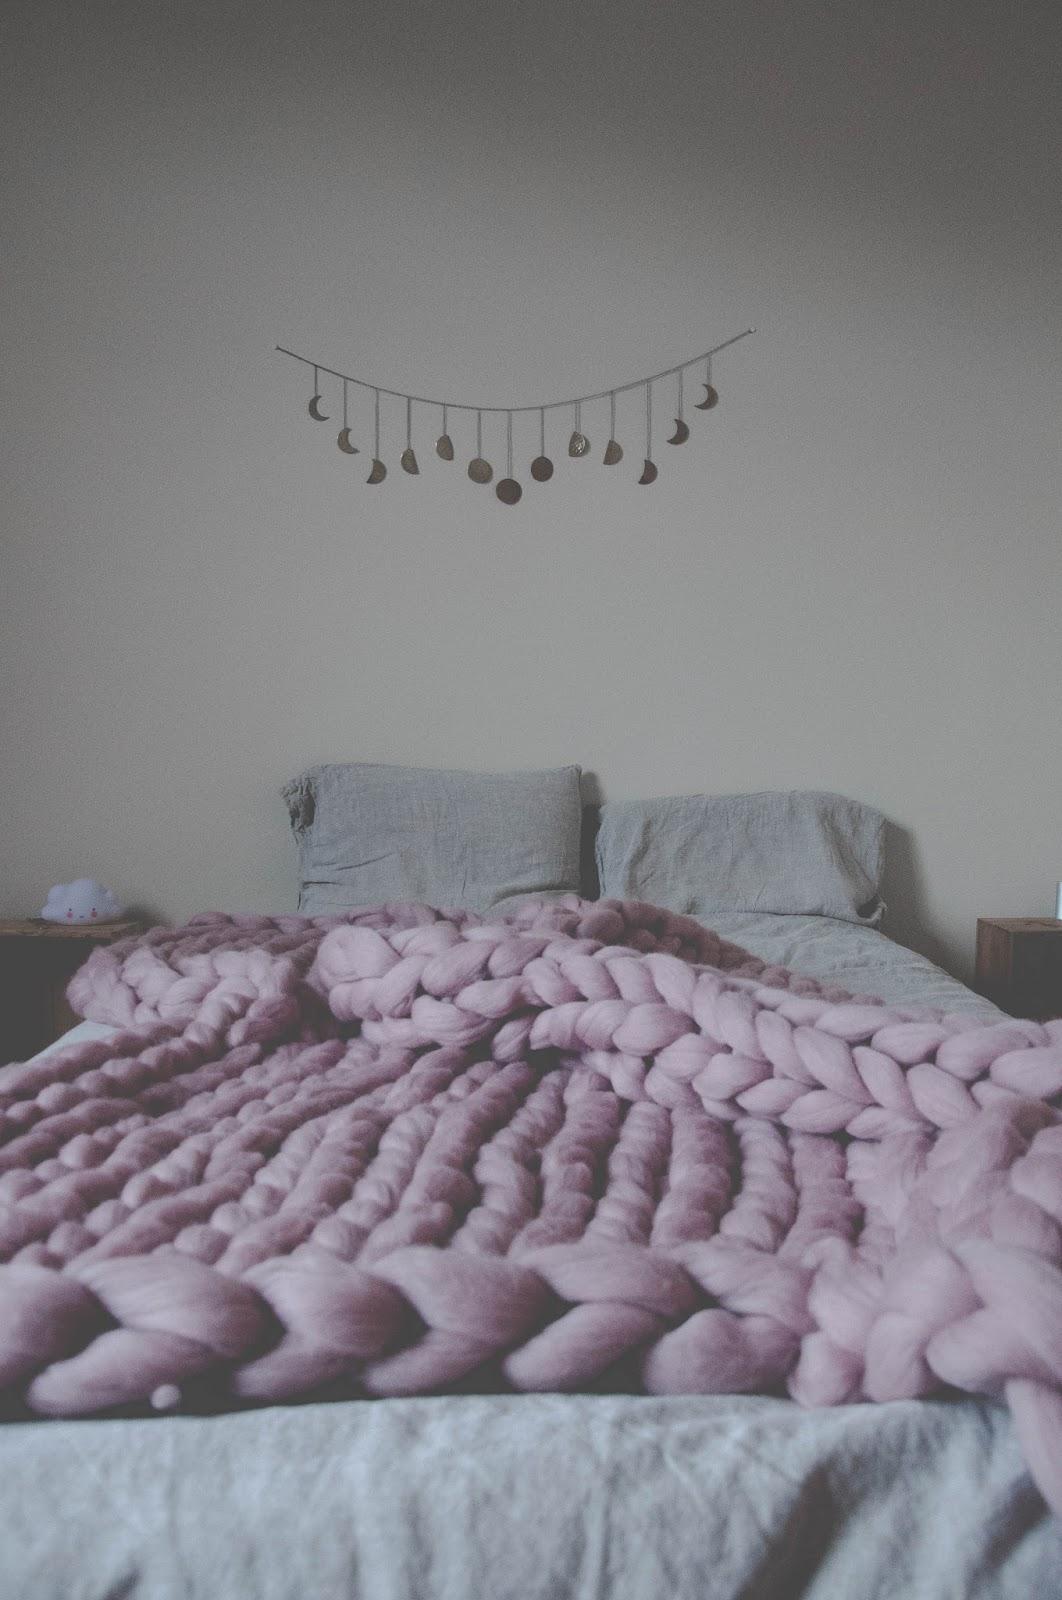 Chunky knit blanket dreams